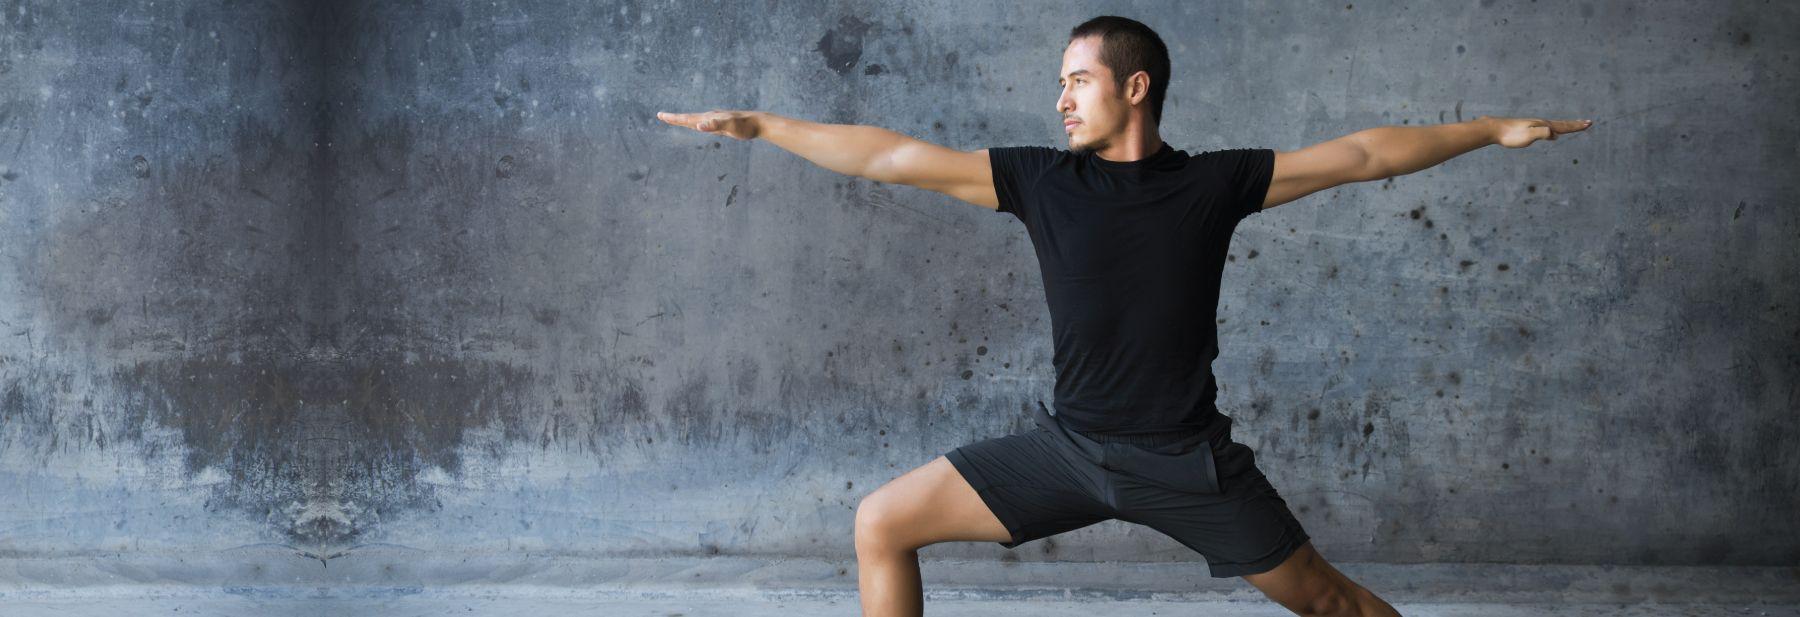 Yoga Studio Houston Joy Yoga Center Houston Near Voss And San Felipe Yoga Center Yoga Vinyasa Yoga Class